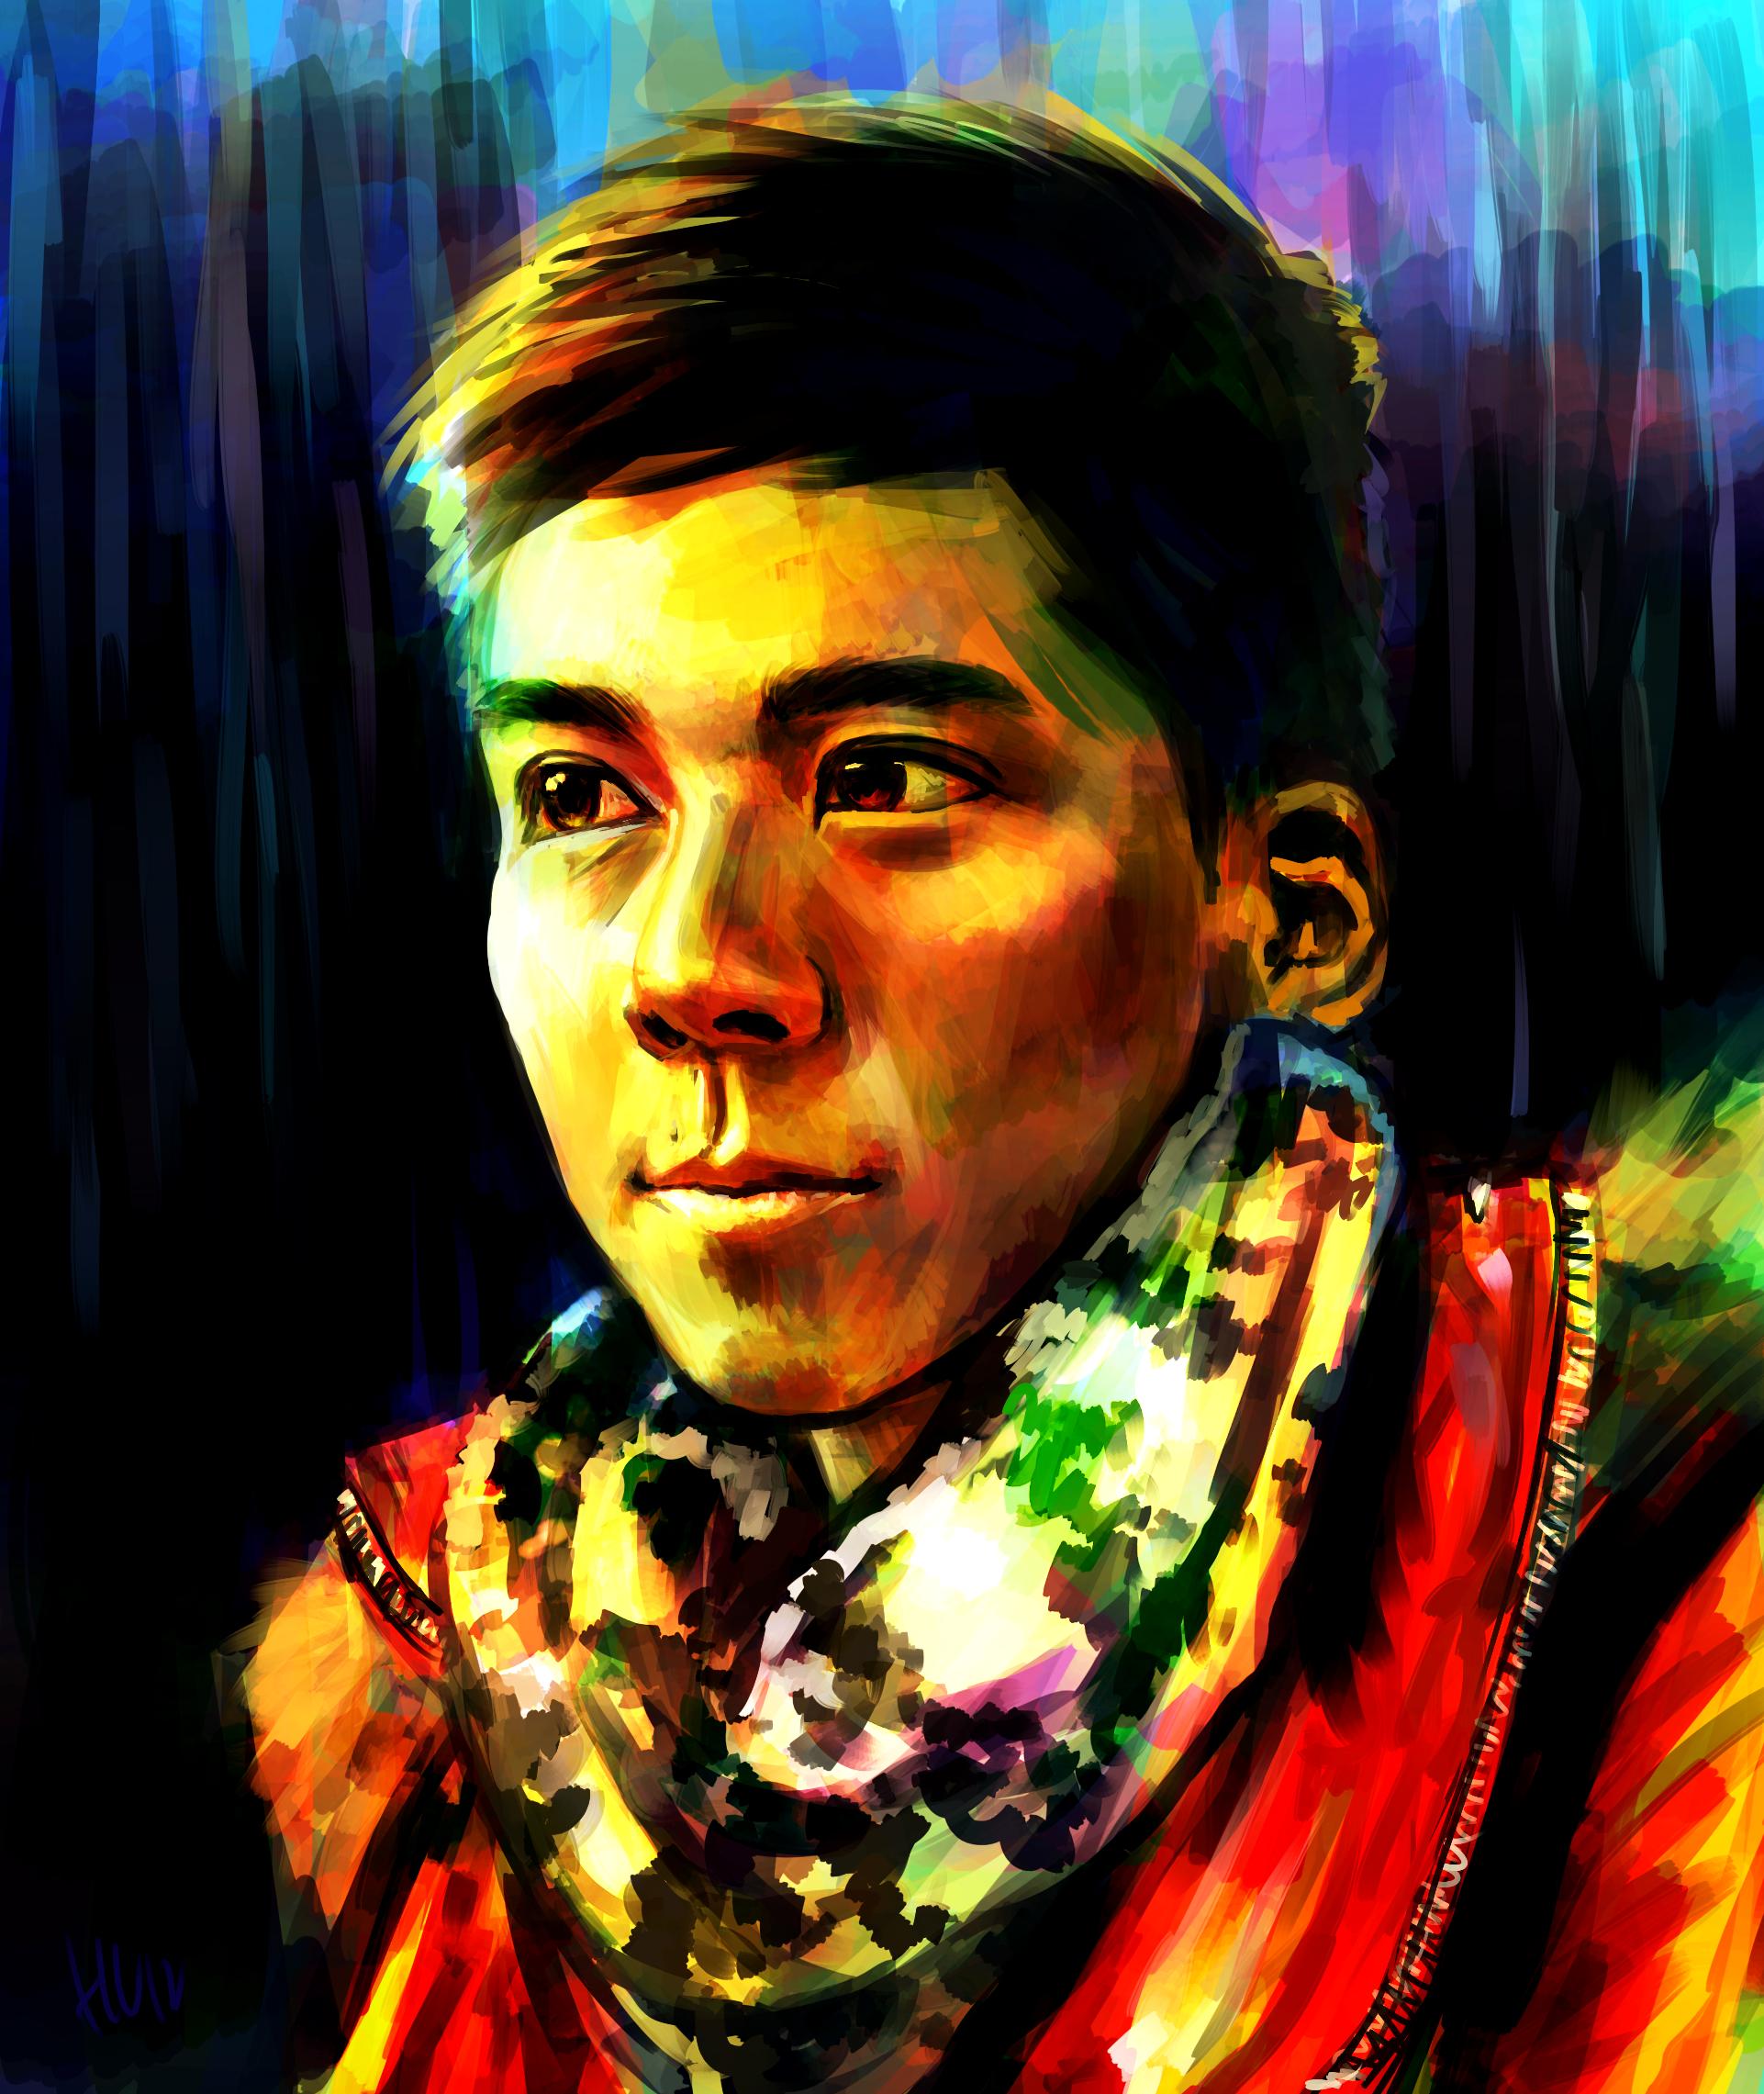 Self Portrait 3 by Haychel